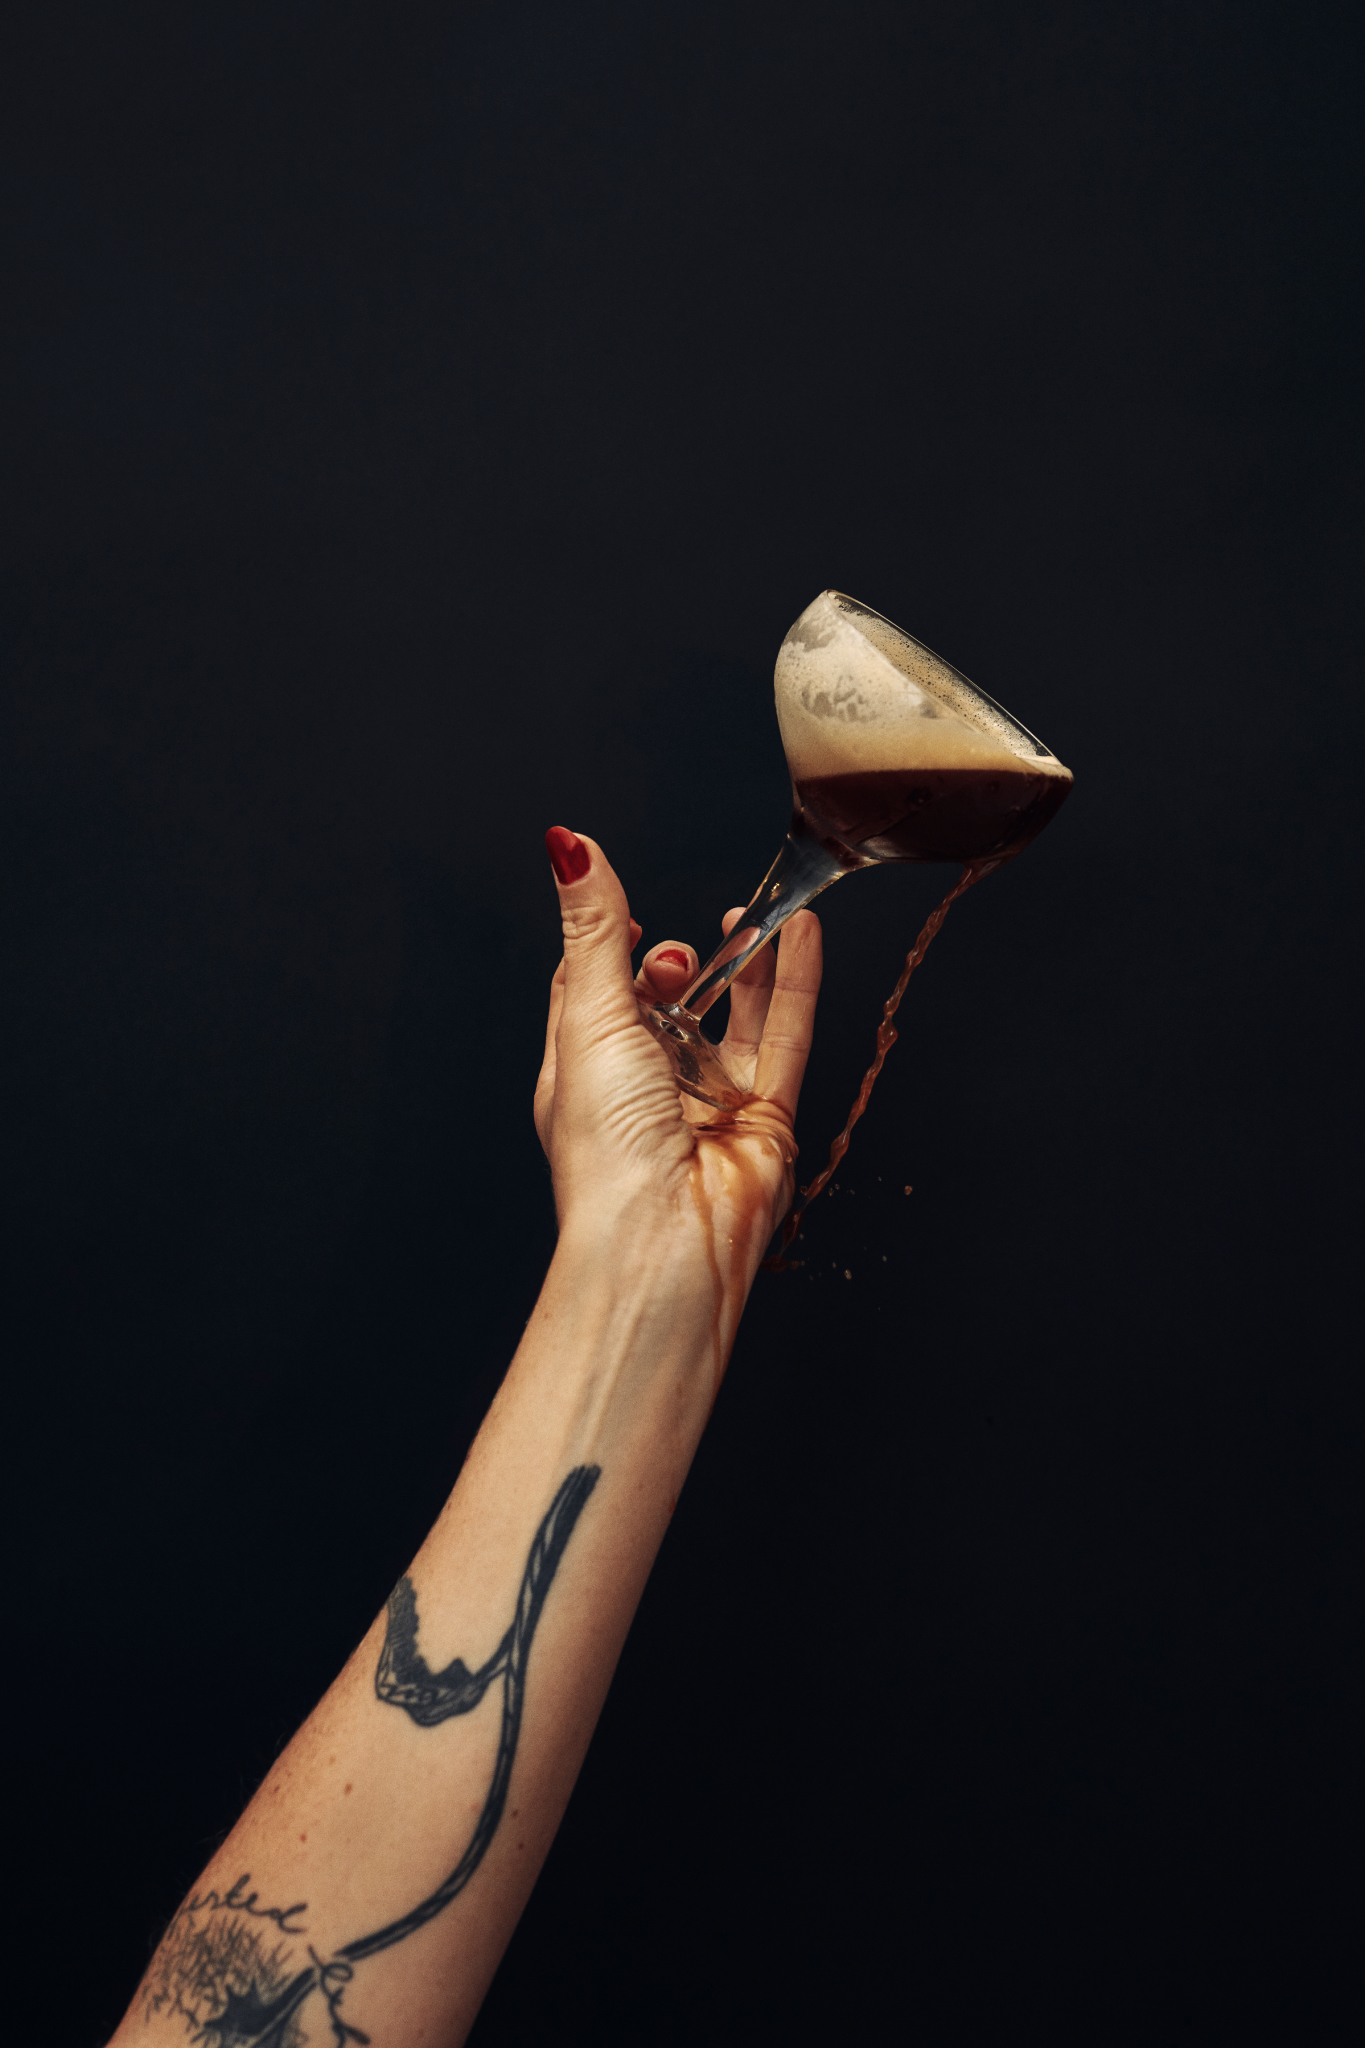 espresso_martini_andreashoumann.jpeg